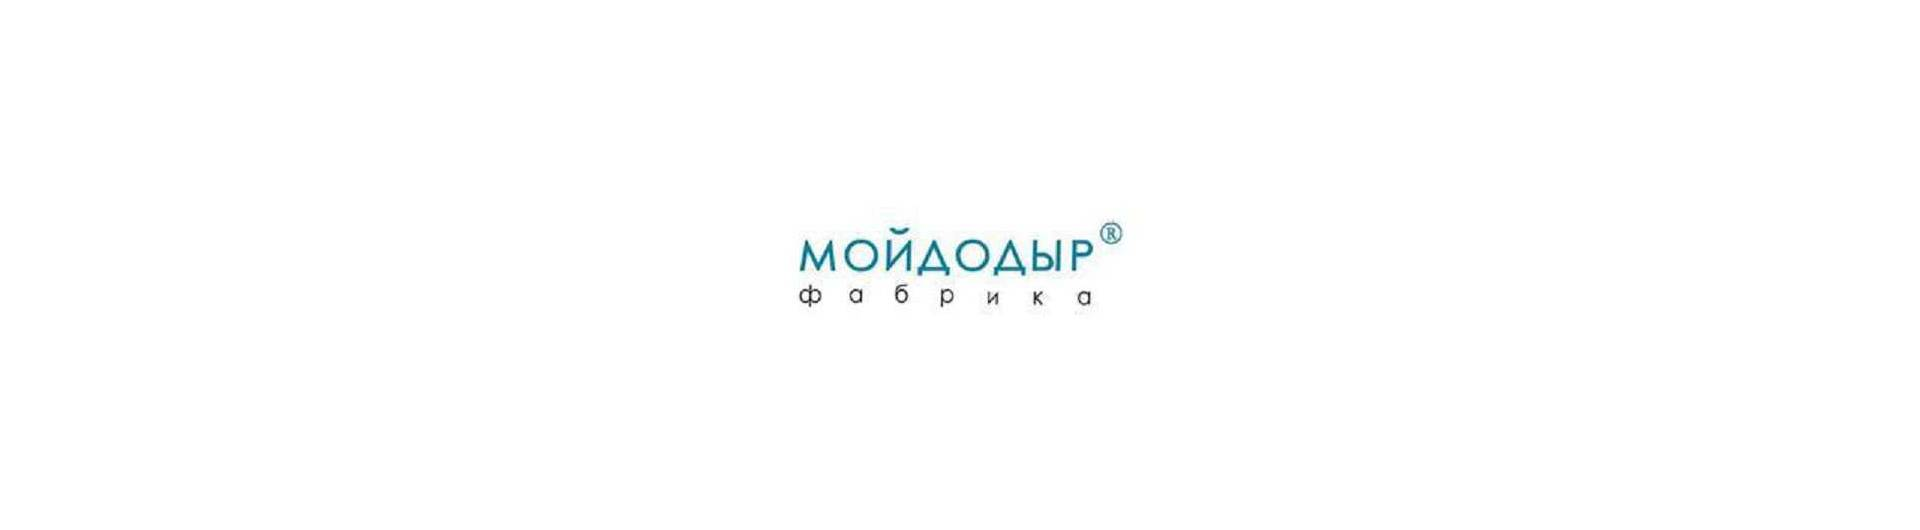 Мебель Мойдодыр